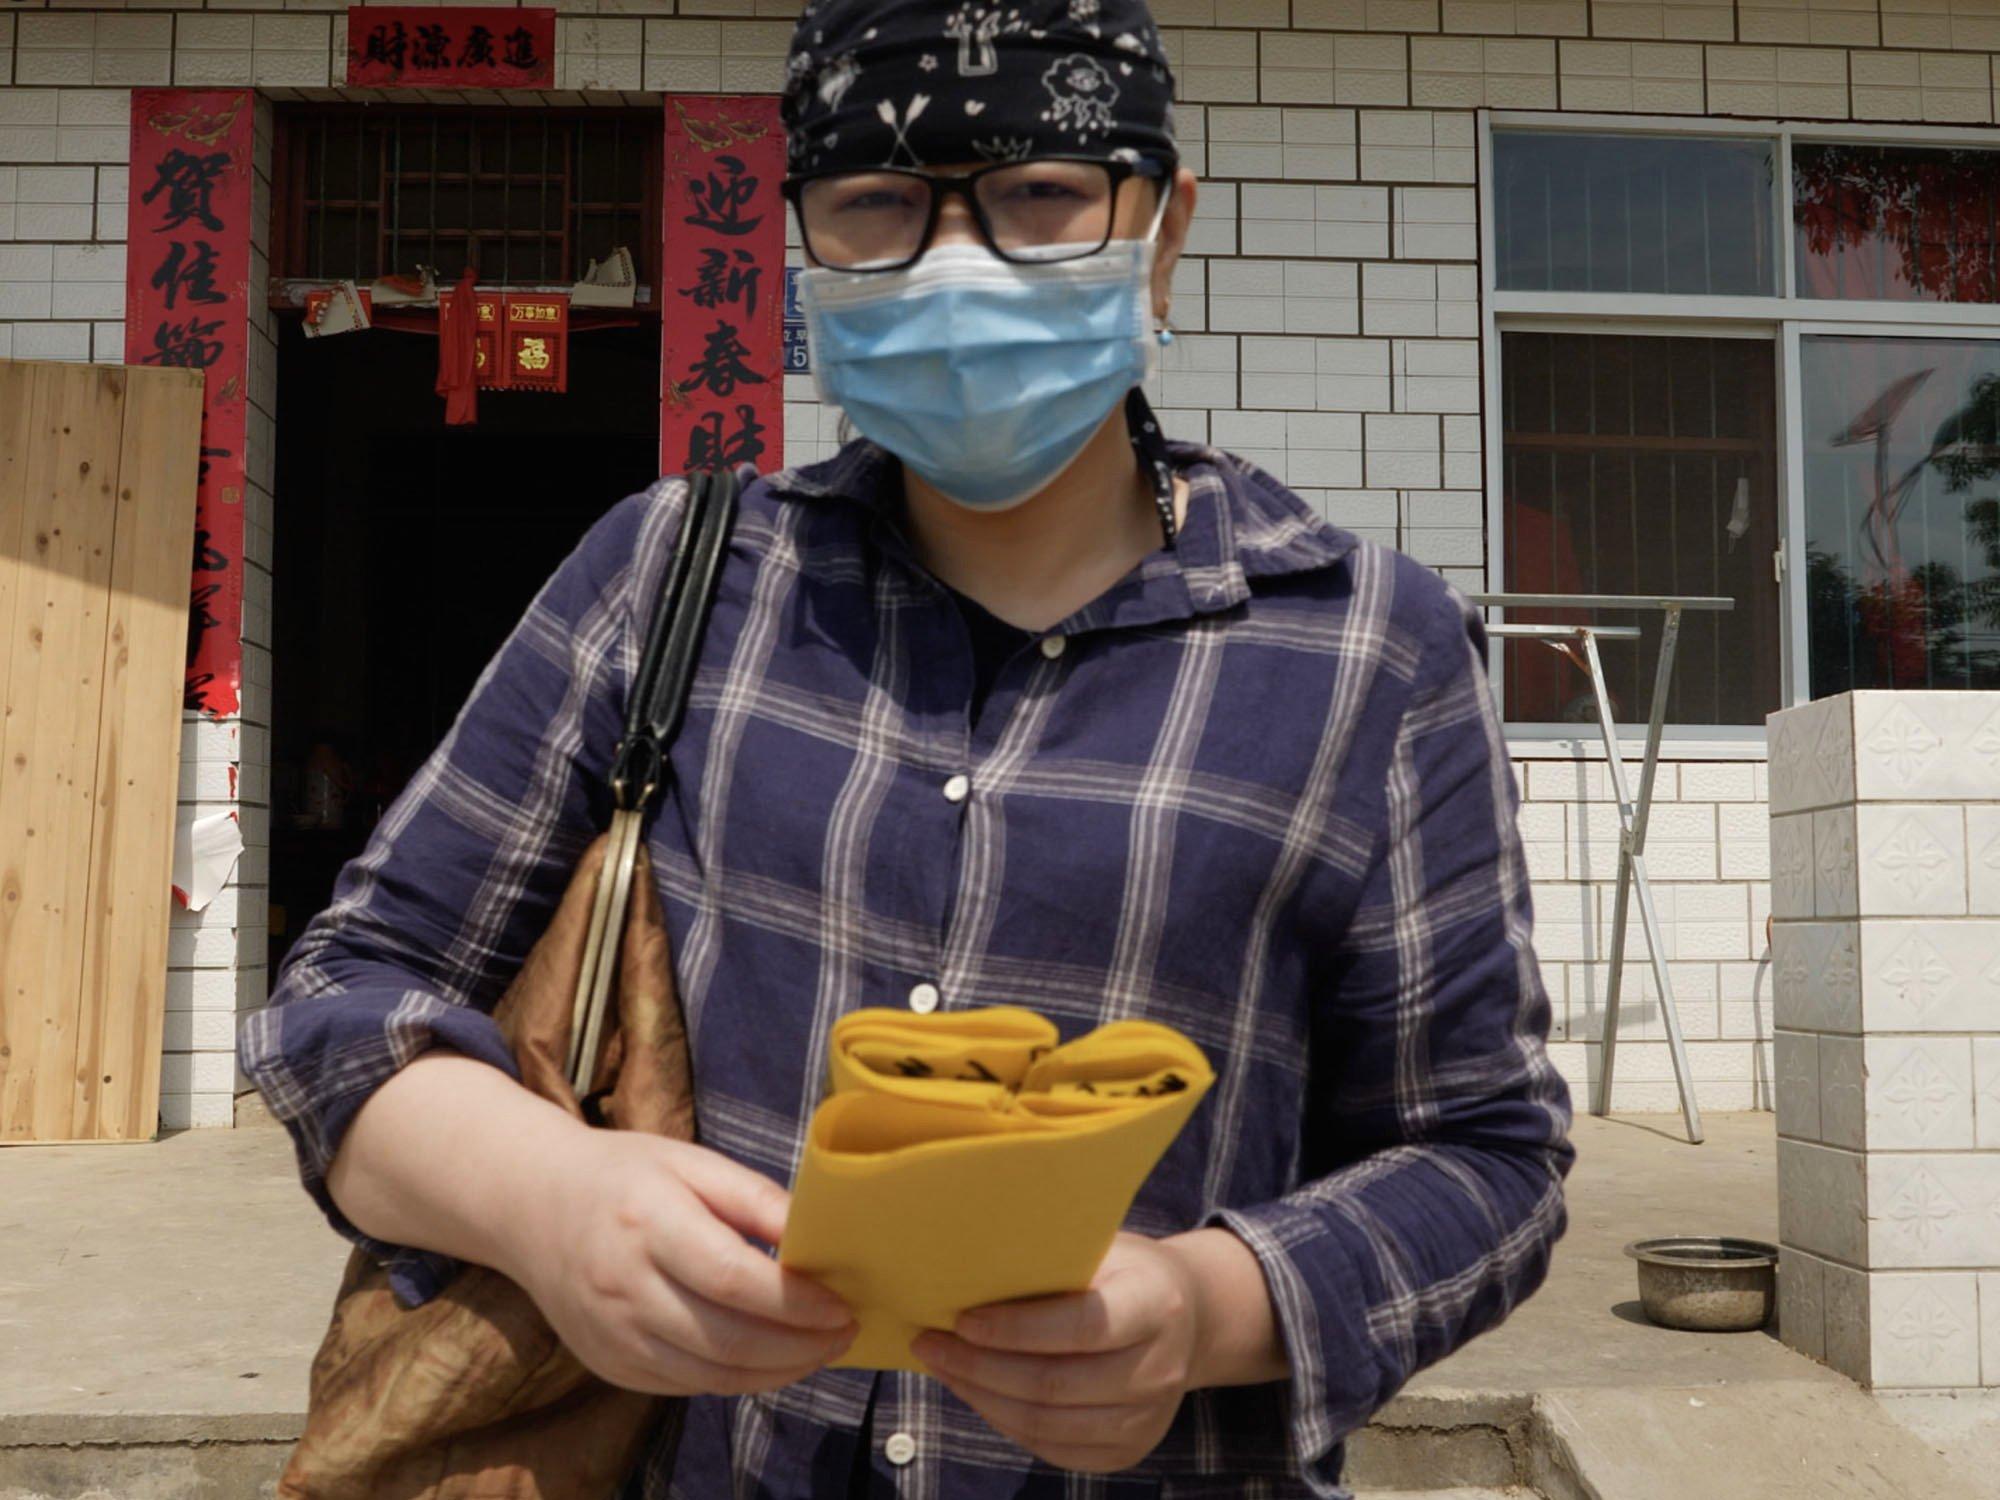 Gospođa Vang oseća krivicu zbog smrti brata